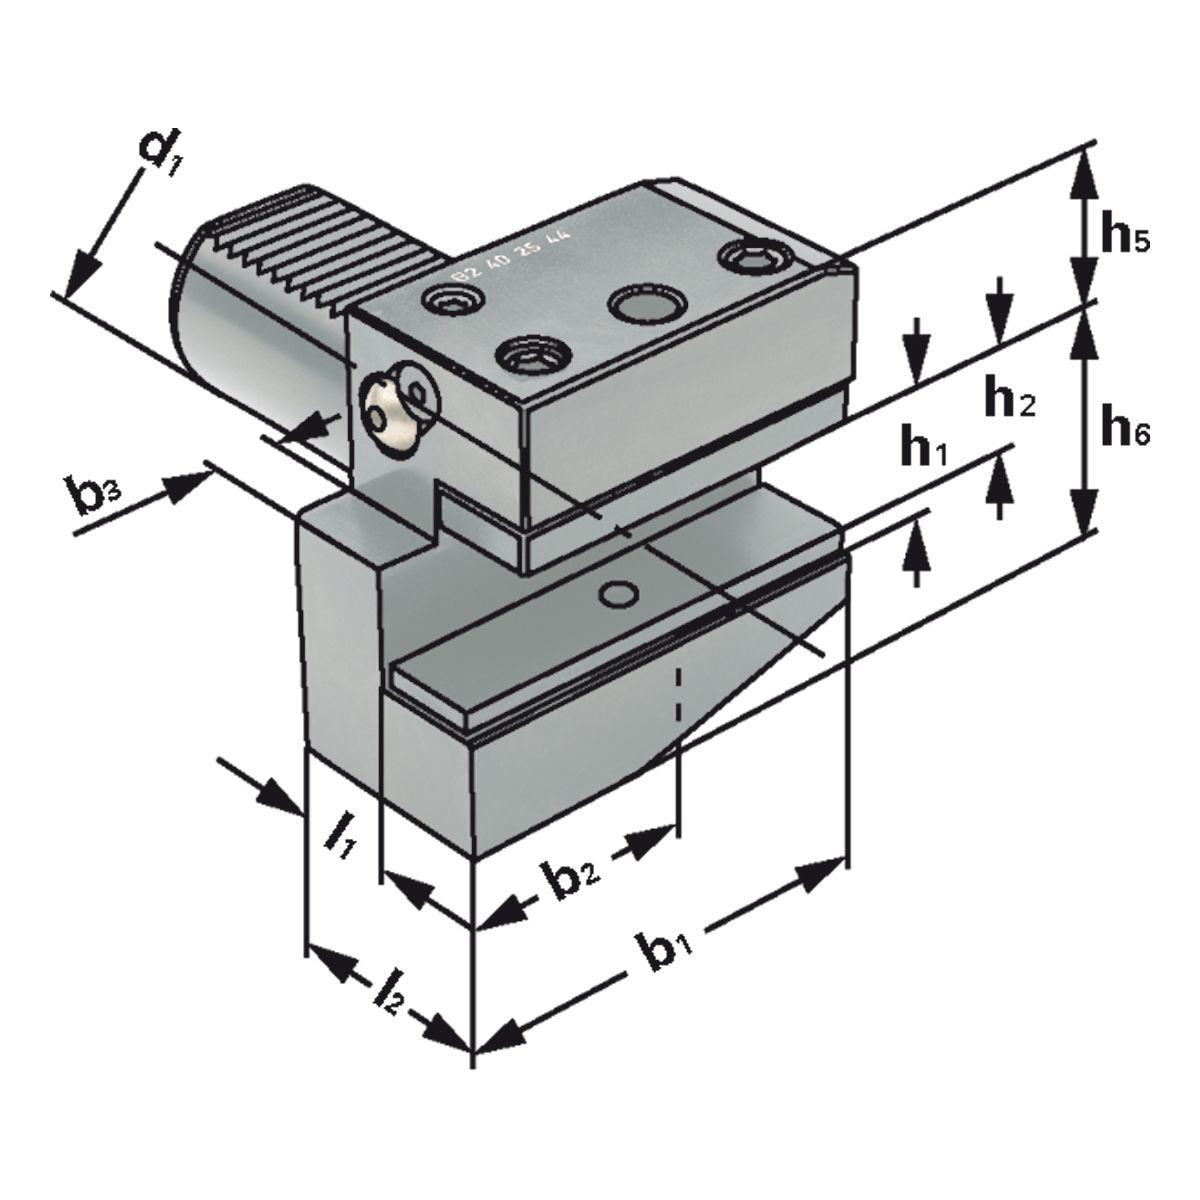 VDI Radial-Werkzeughalter - Kurz - Typ B1/B2